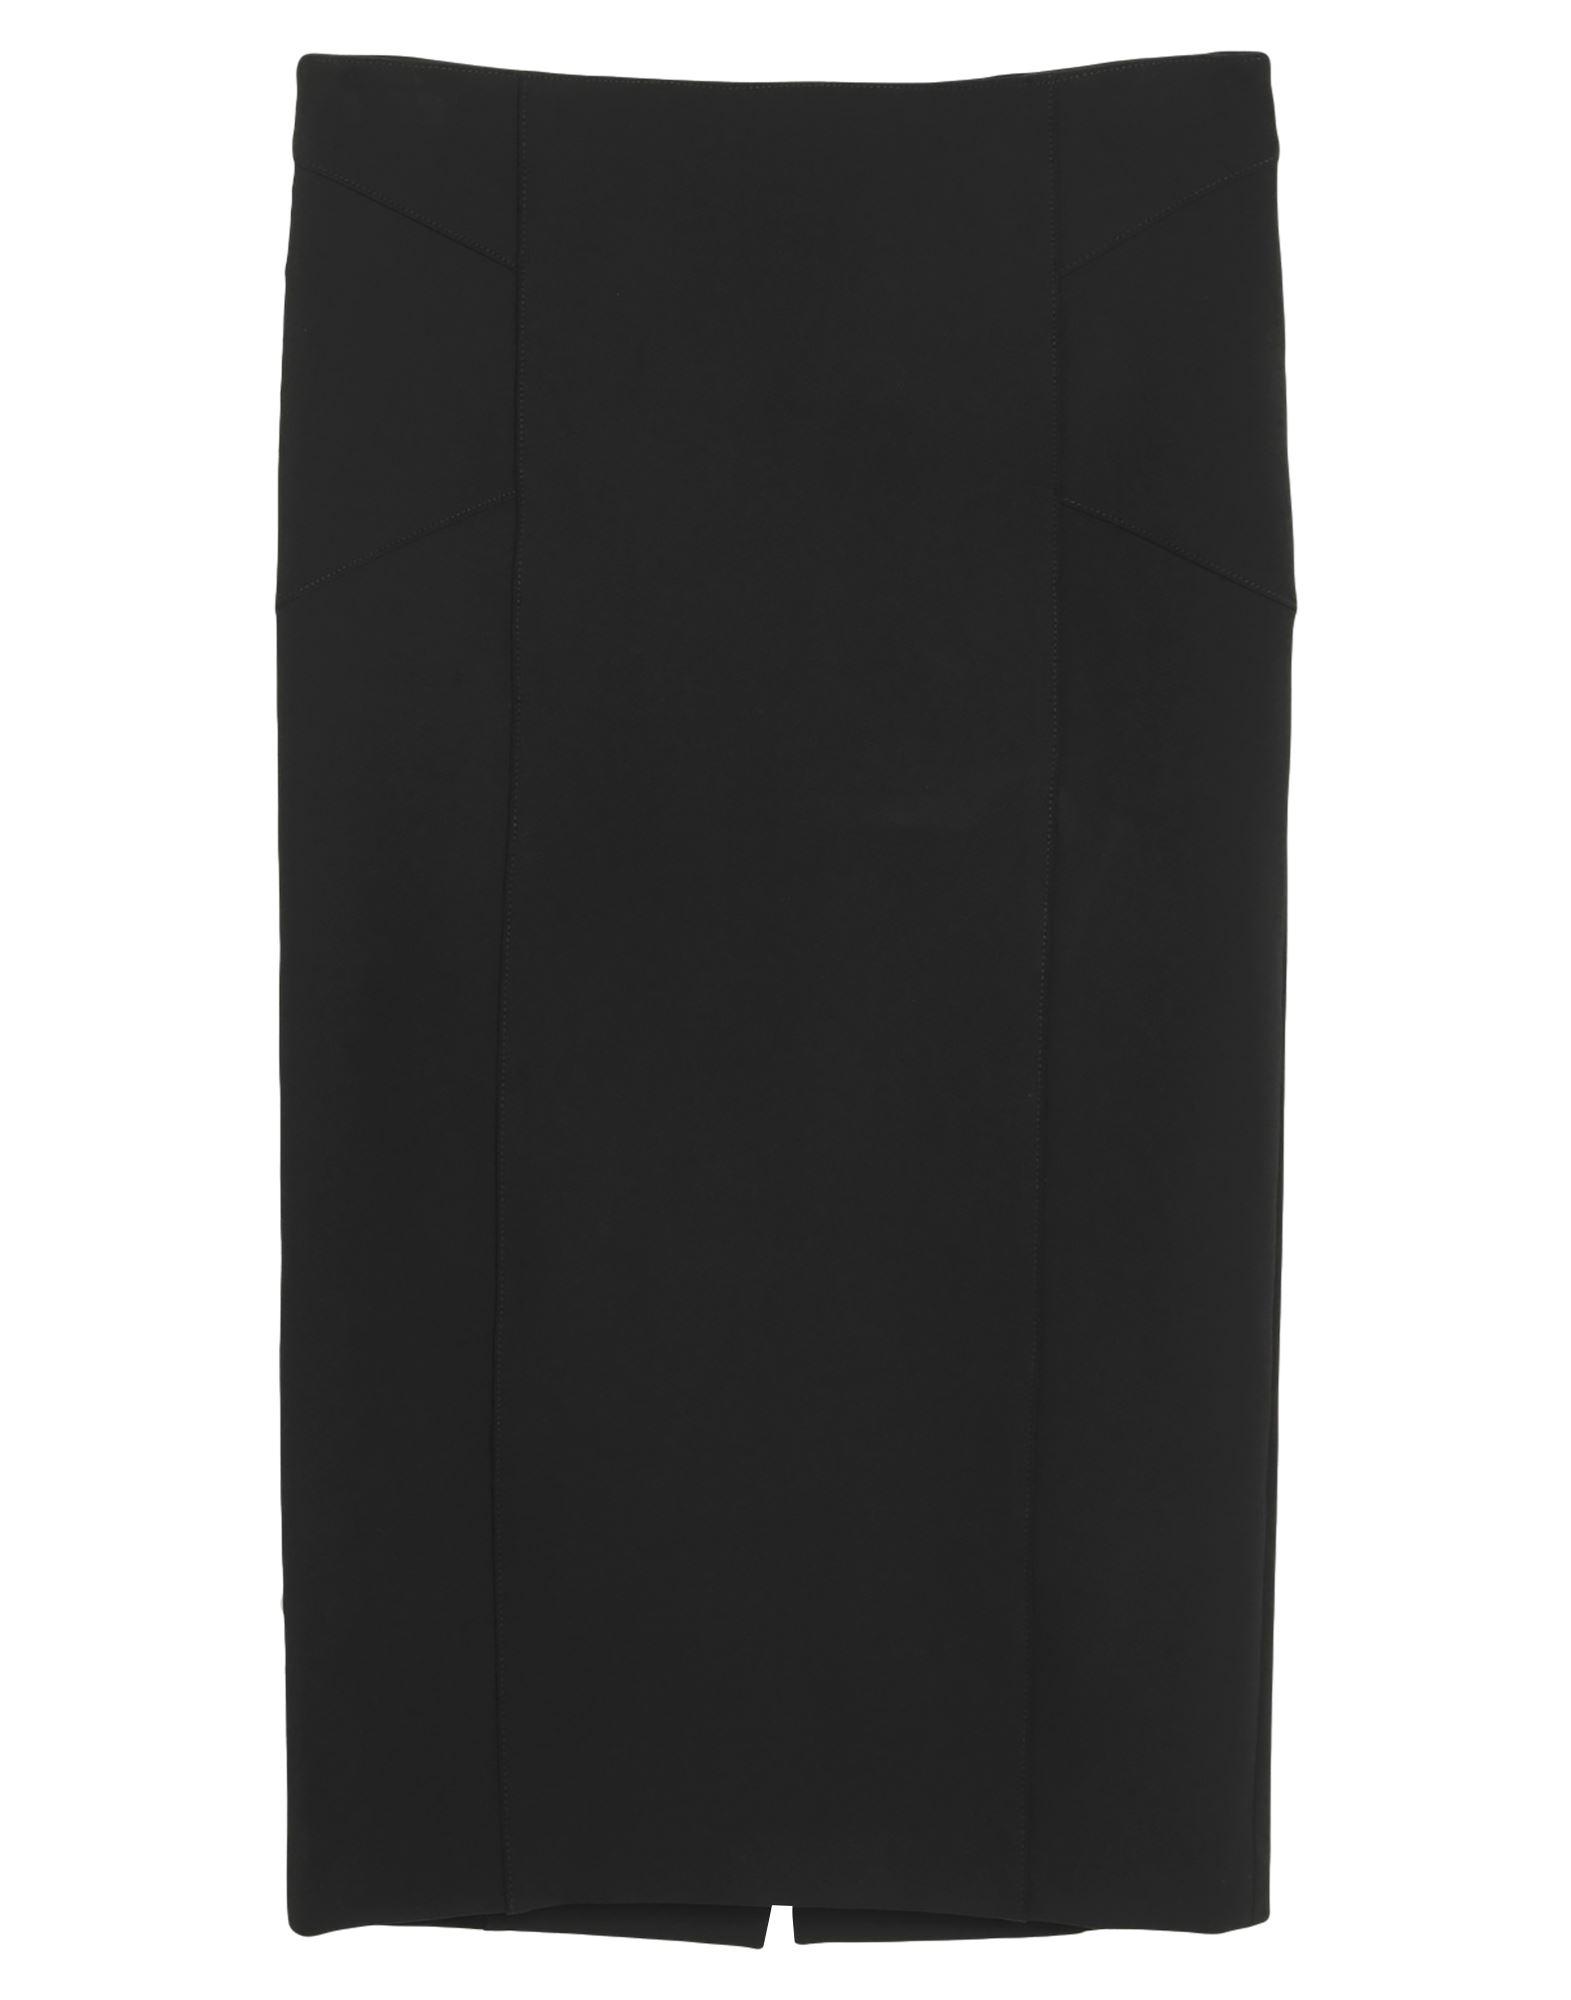 VERONICA BEARD 3/4 length skirts. jersey, no appliqués, basic solid color, no pockets, rear closure, zipper closure, unlined, stretch. 86% Nylon, 14% Elastane